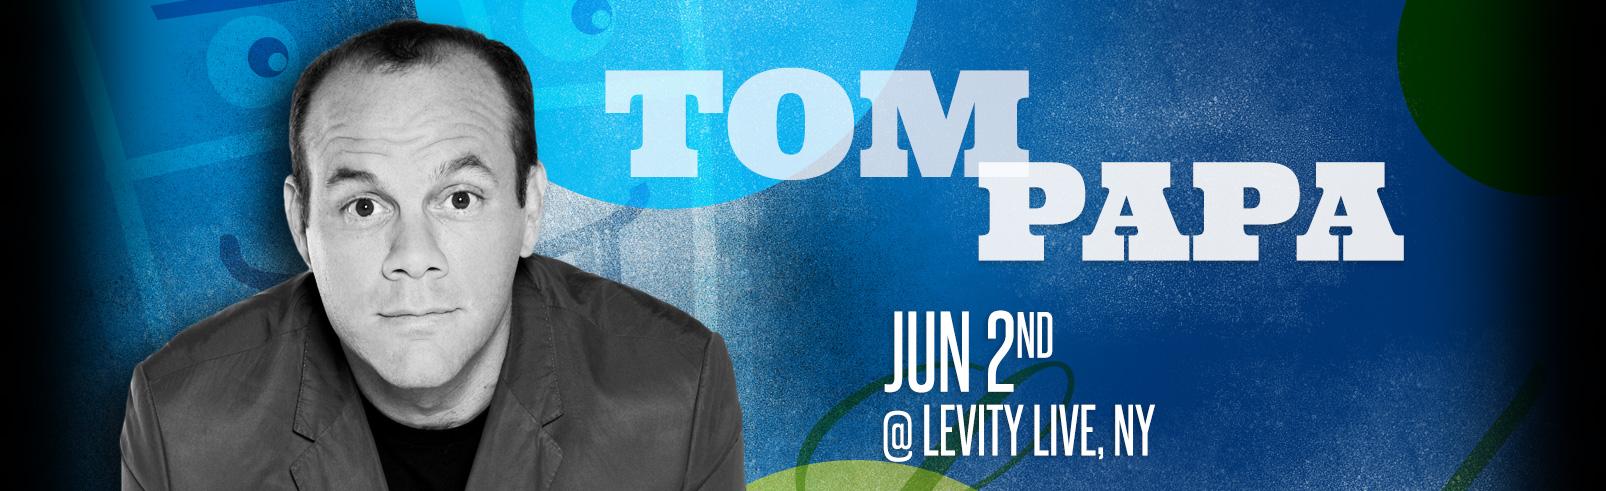 Tom Papa @ Levity Live